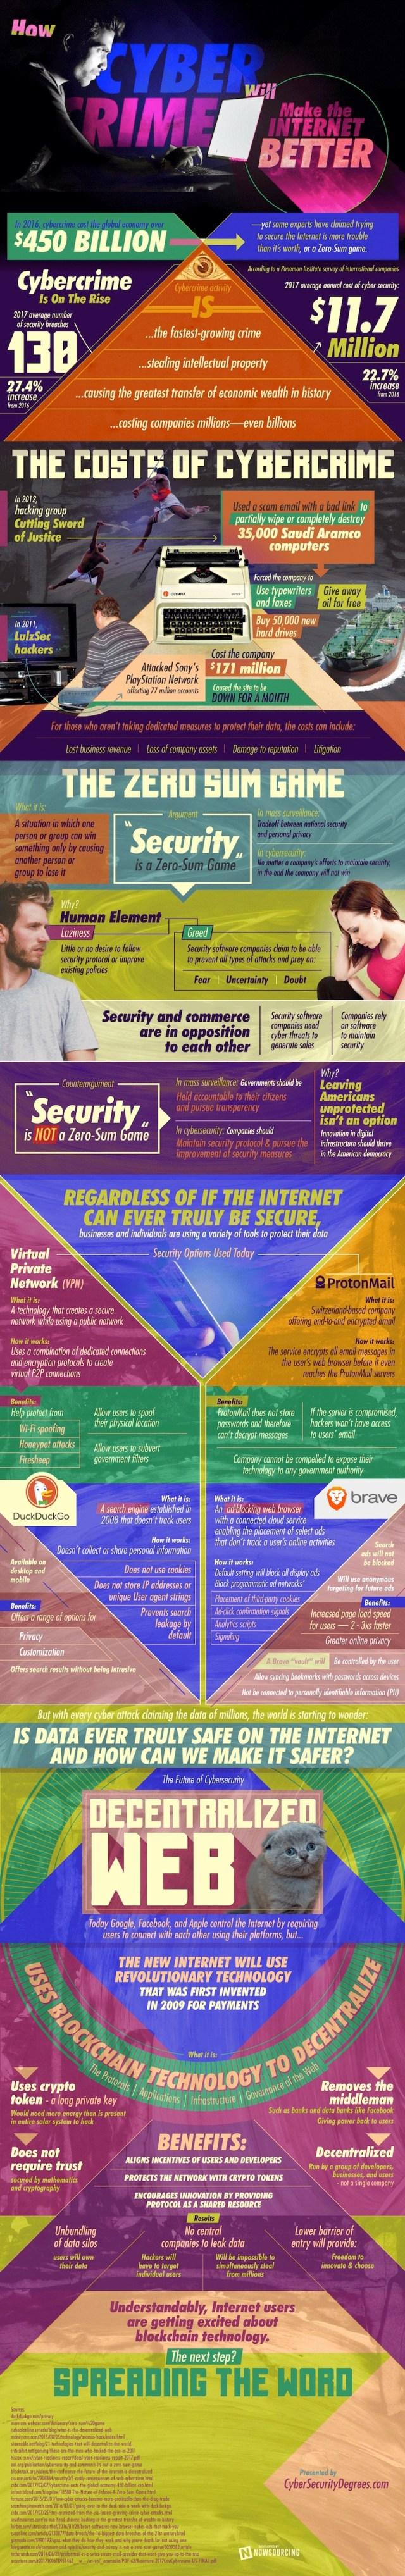 Cybercrime internet info